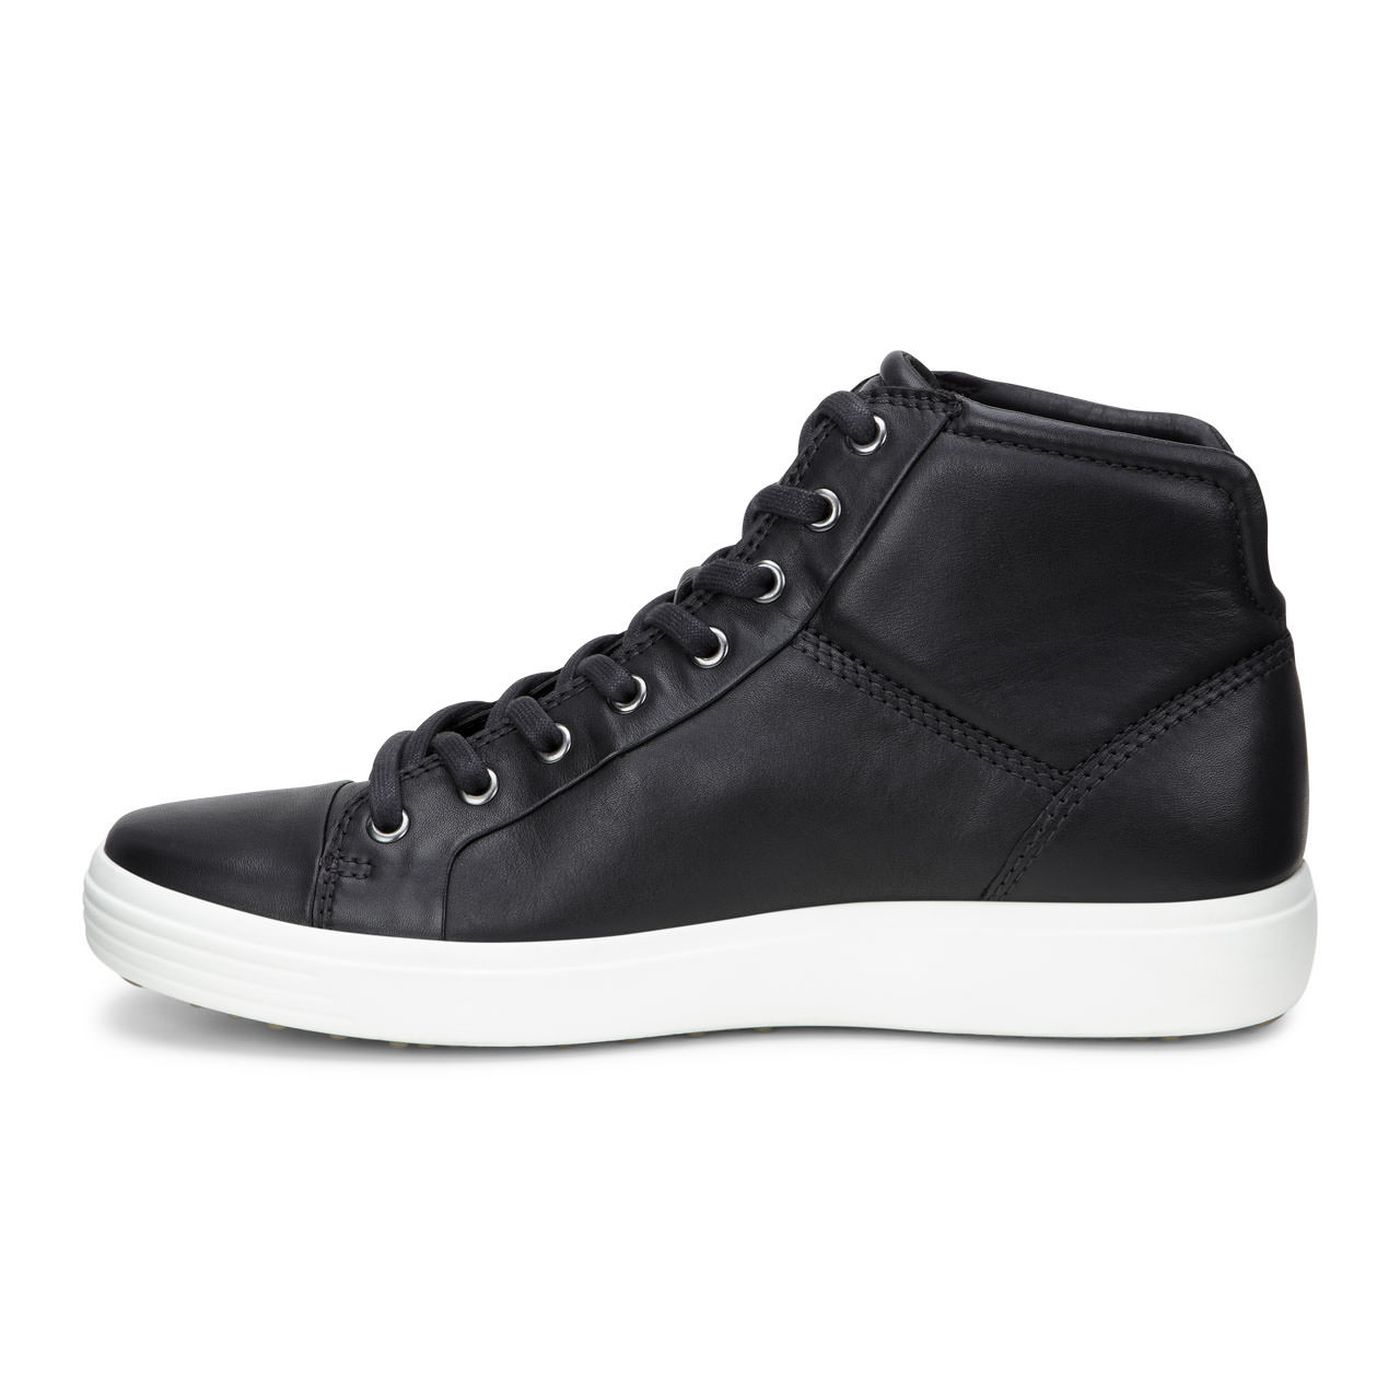 Mens boots casual, Casual boots, Ecco shoes